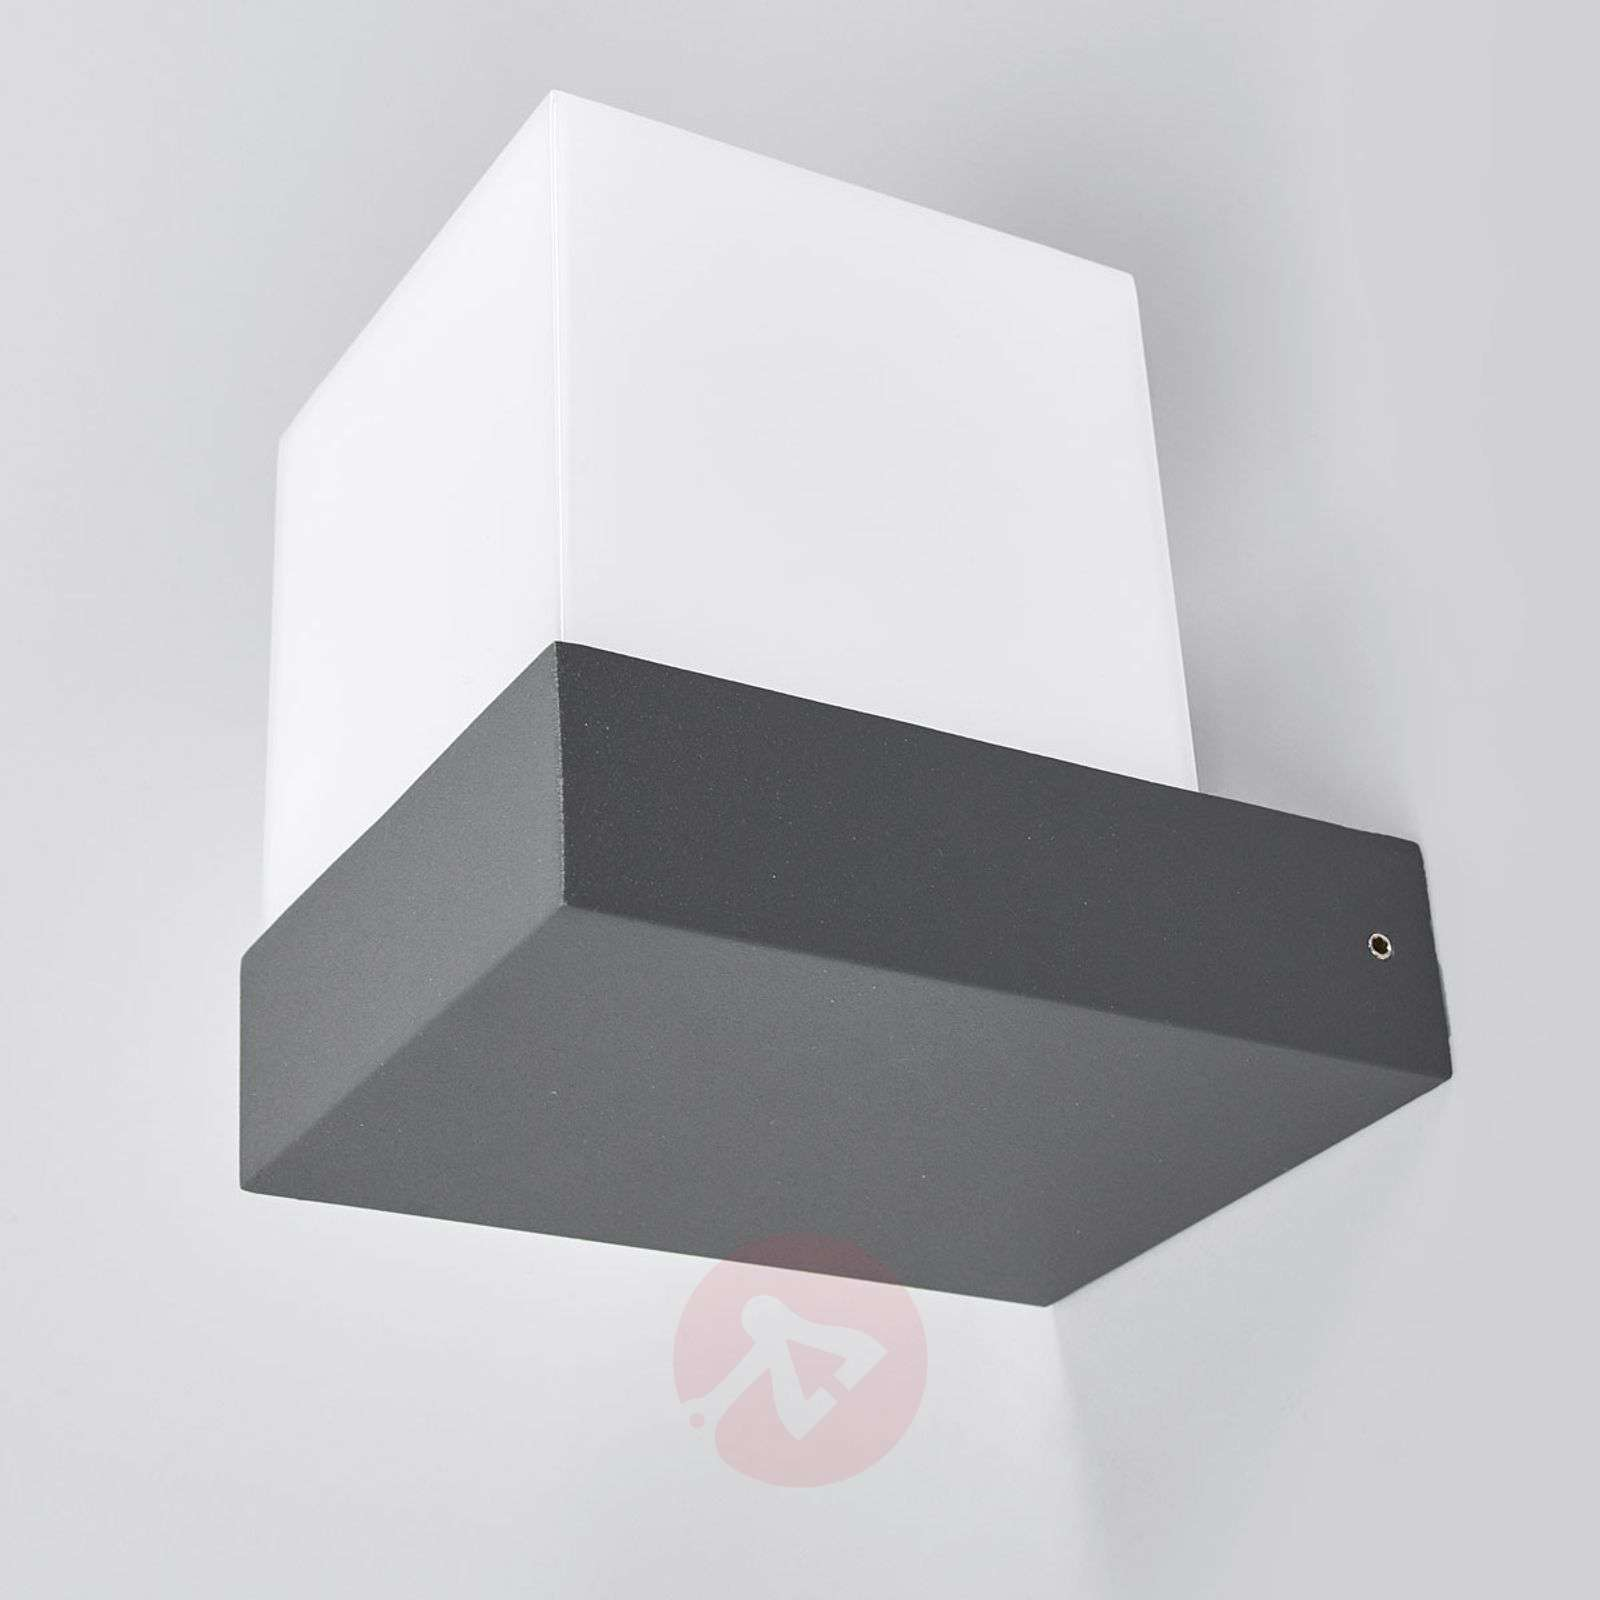 Pelina led outdoor wall light in cube shape lights pelina led outdoor wall light in cube shape 9618099 01 aloadofball Choice Image